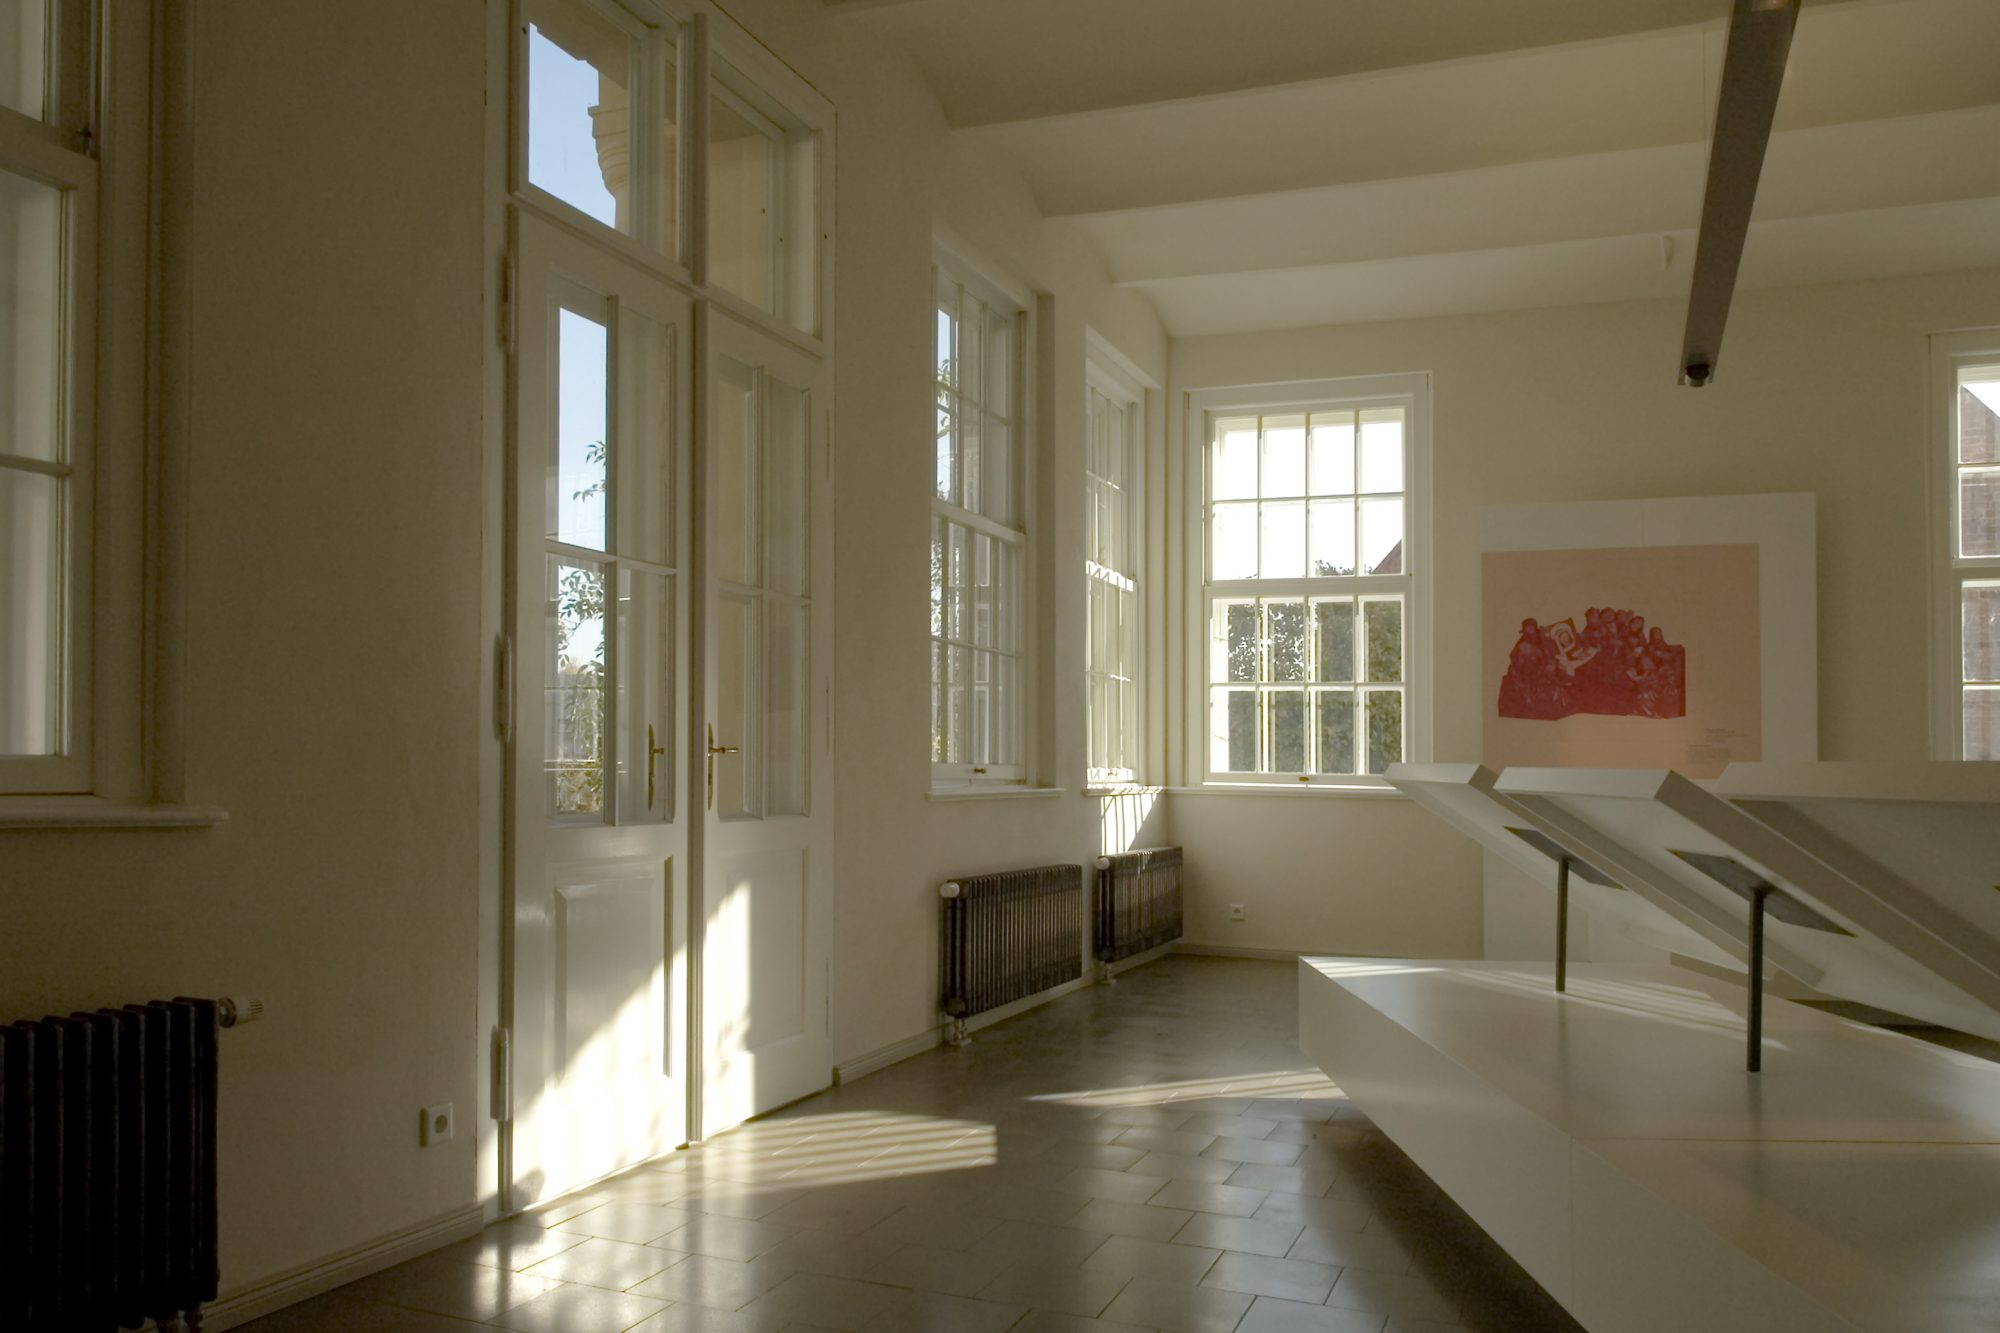 Ausstellung durch ecke design Albrecht Ecke